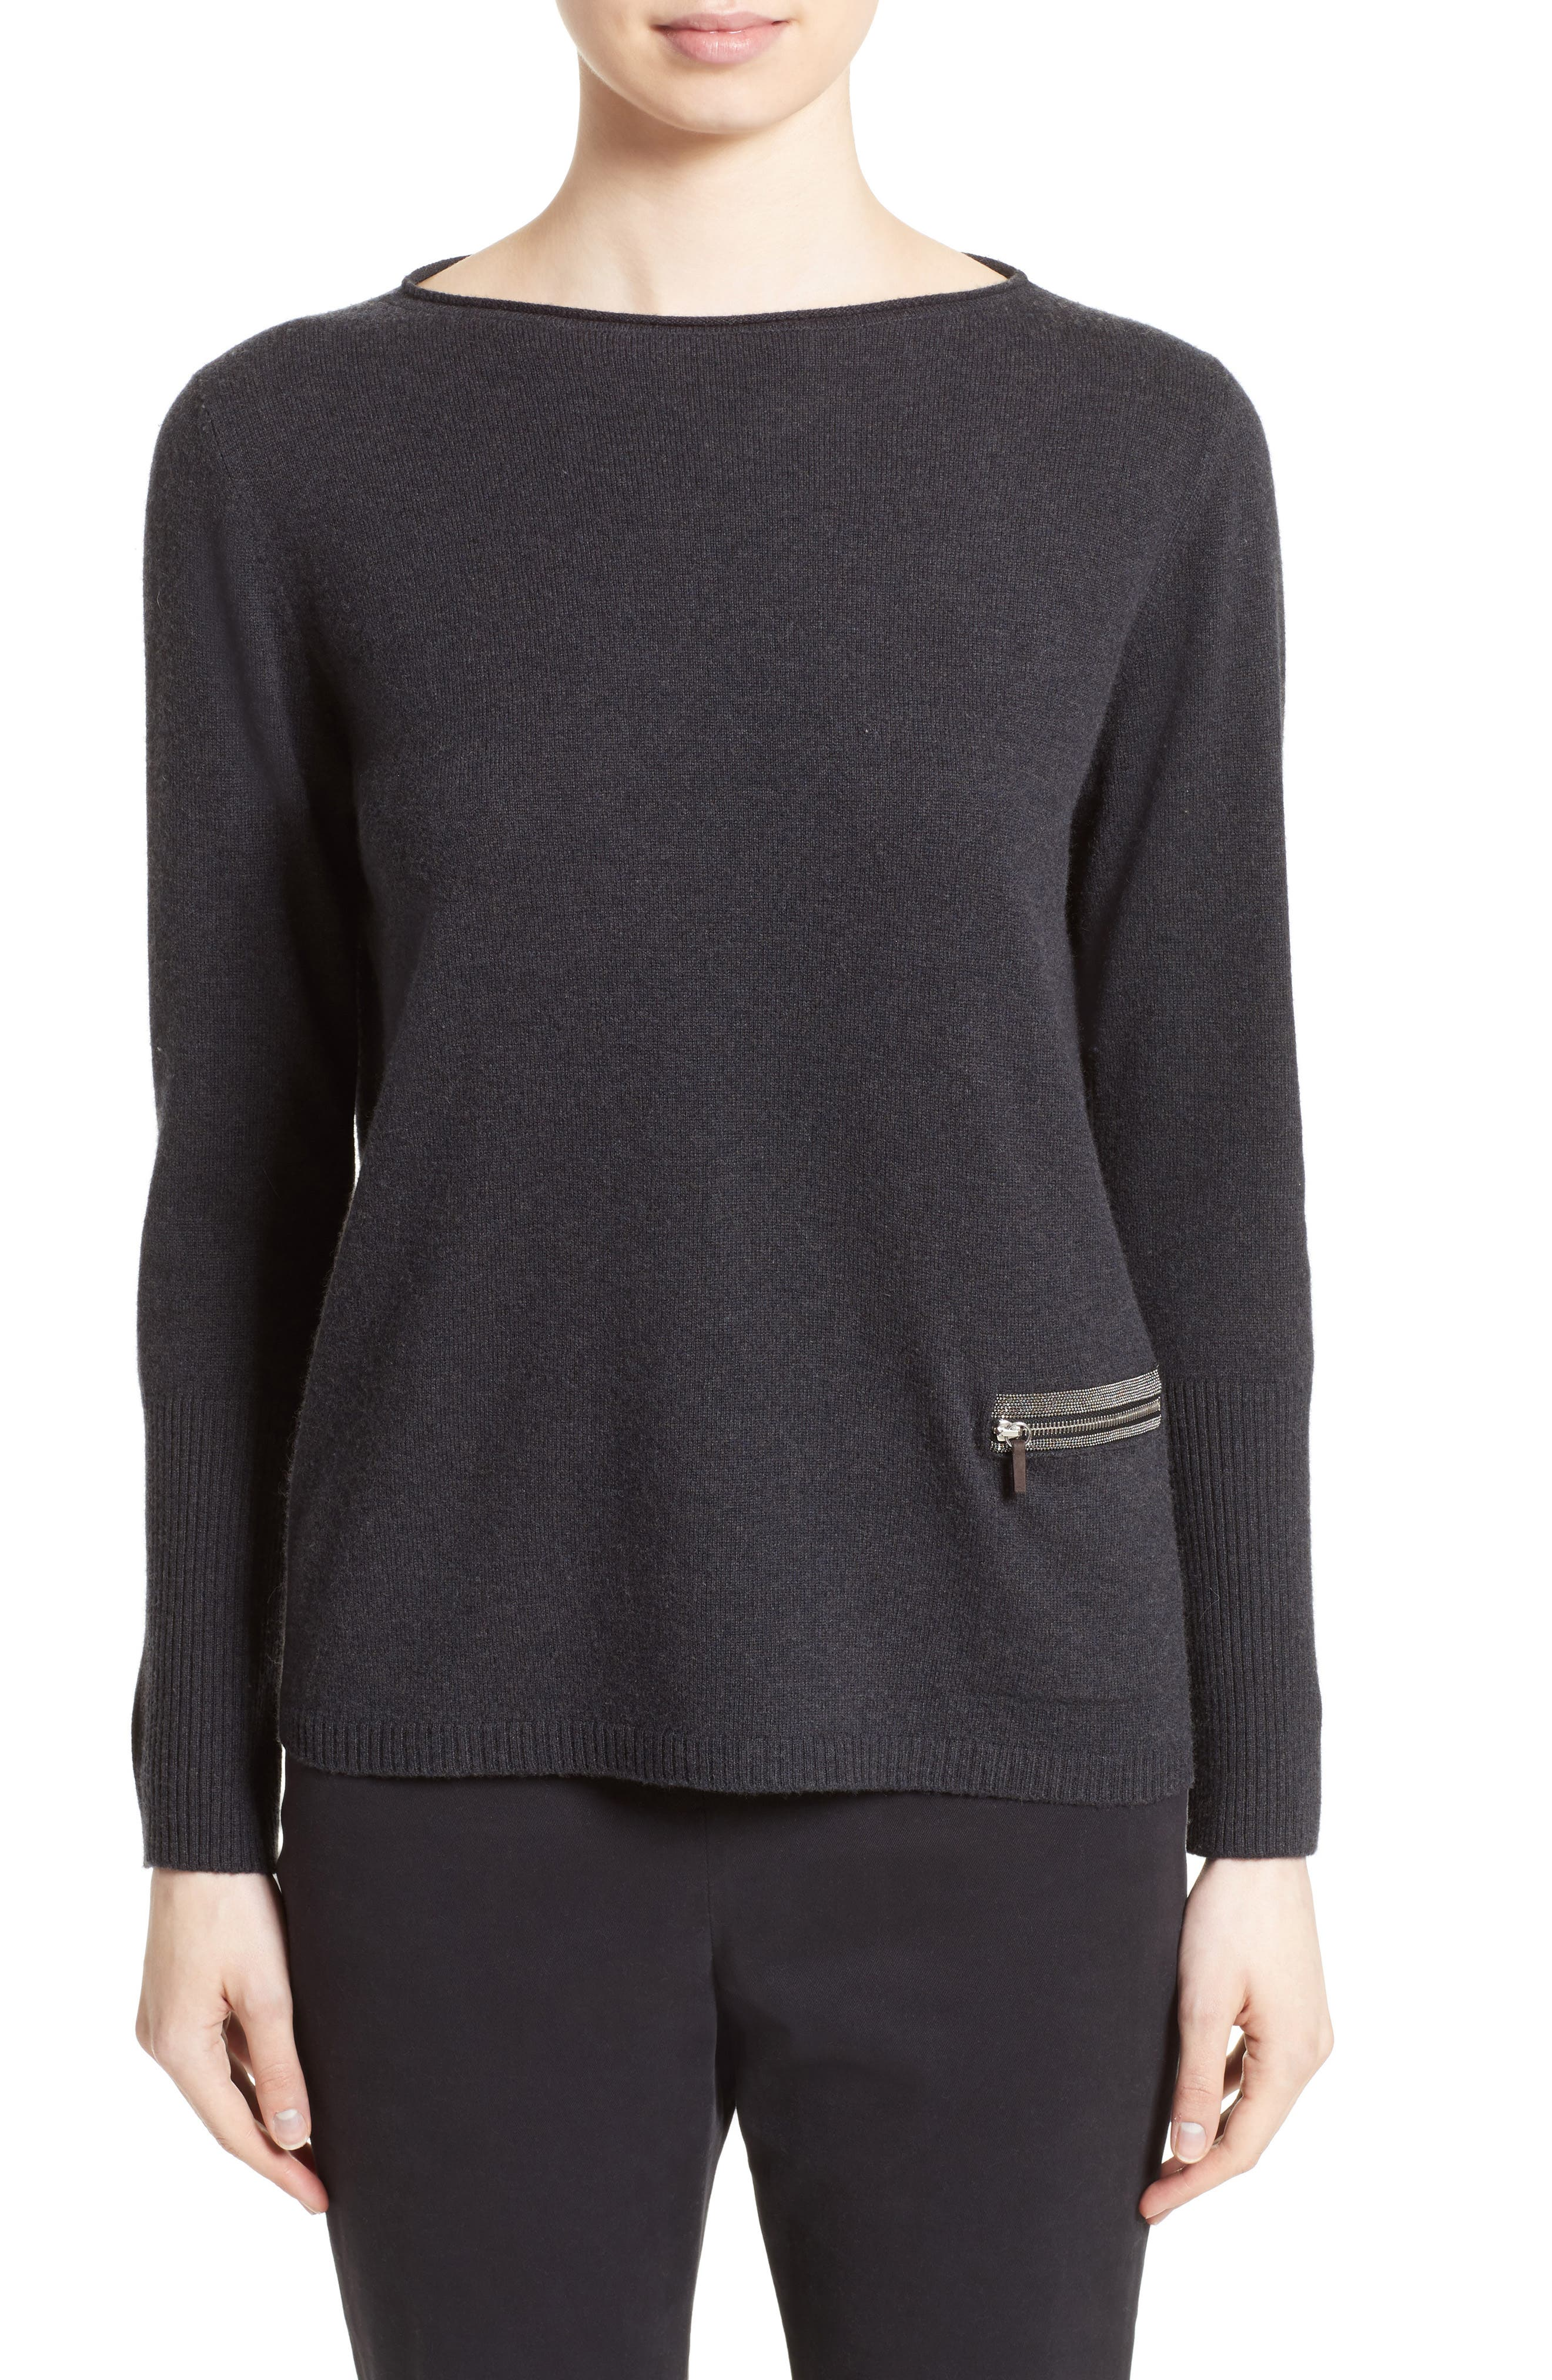 Fabiana Filippi Wool, Silk & Cashmere Boatneck Sweater